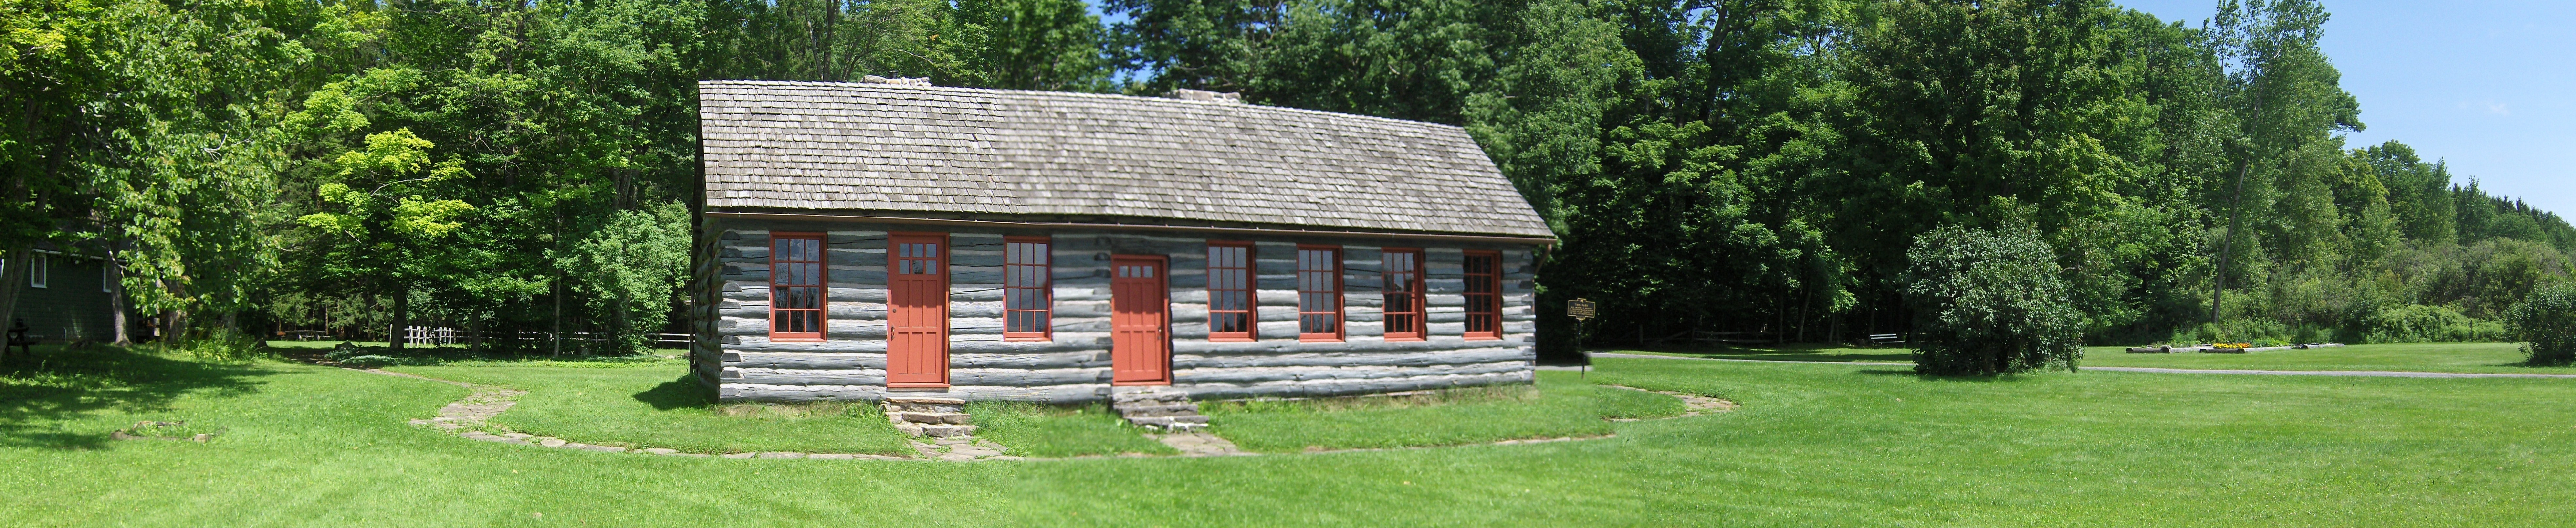 Steuben's replica log cabin